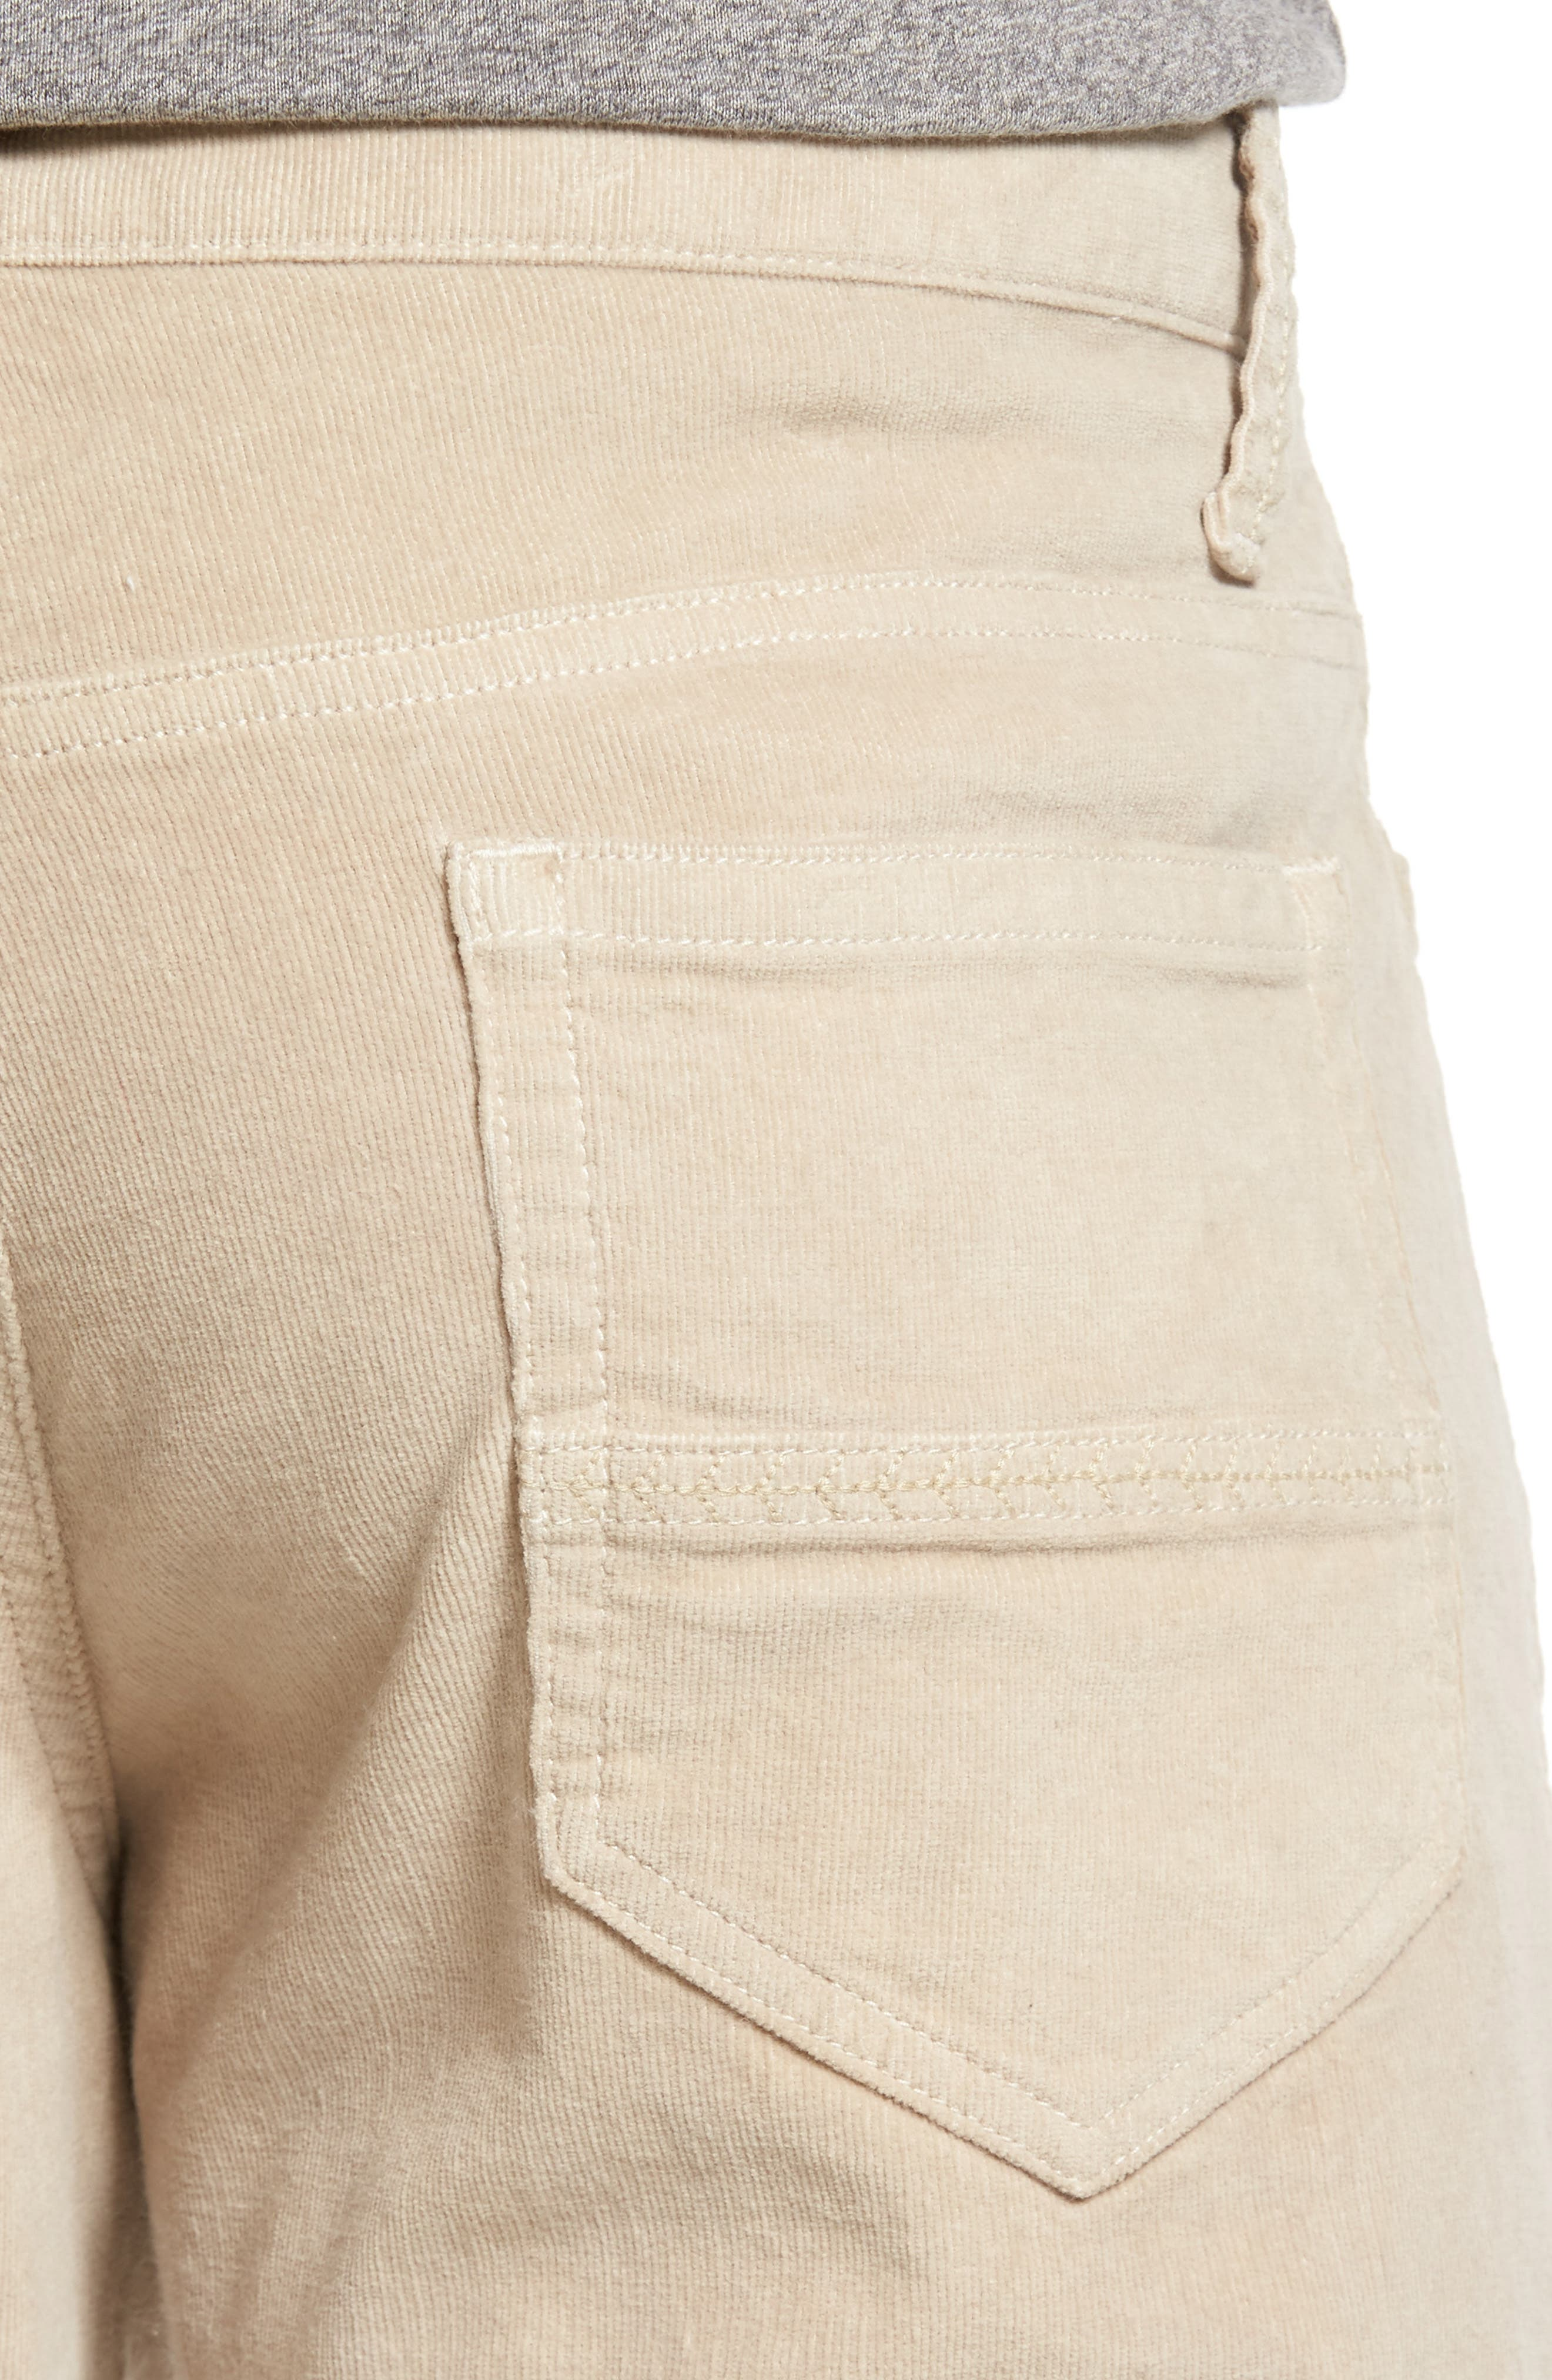 Modern Fit Stretch Corduroy Pants,                             Alternate thumbnail 4, color,                             Oatmeal